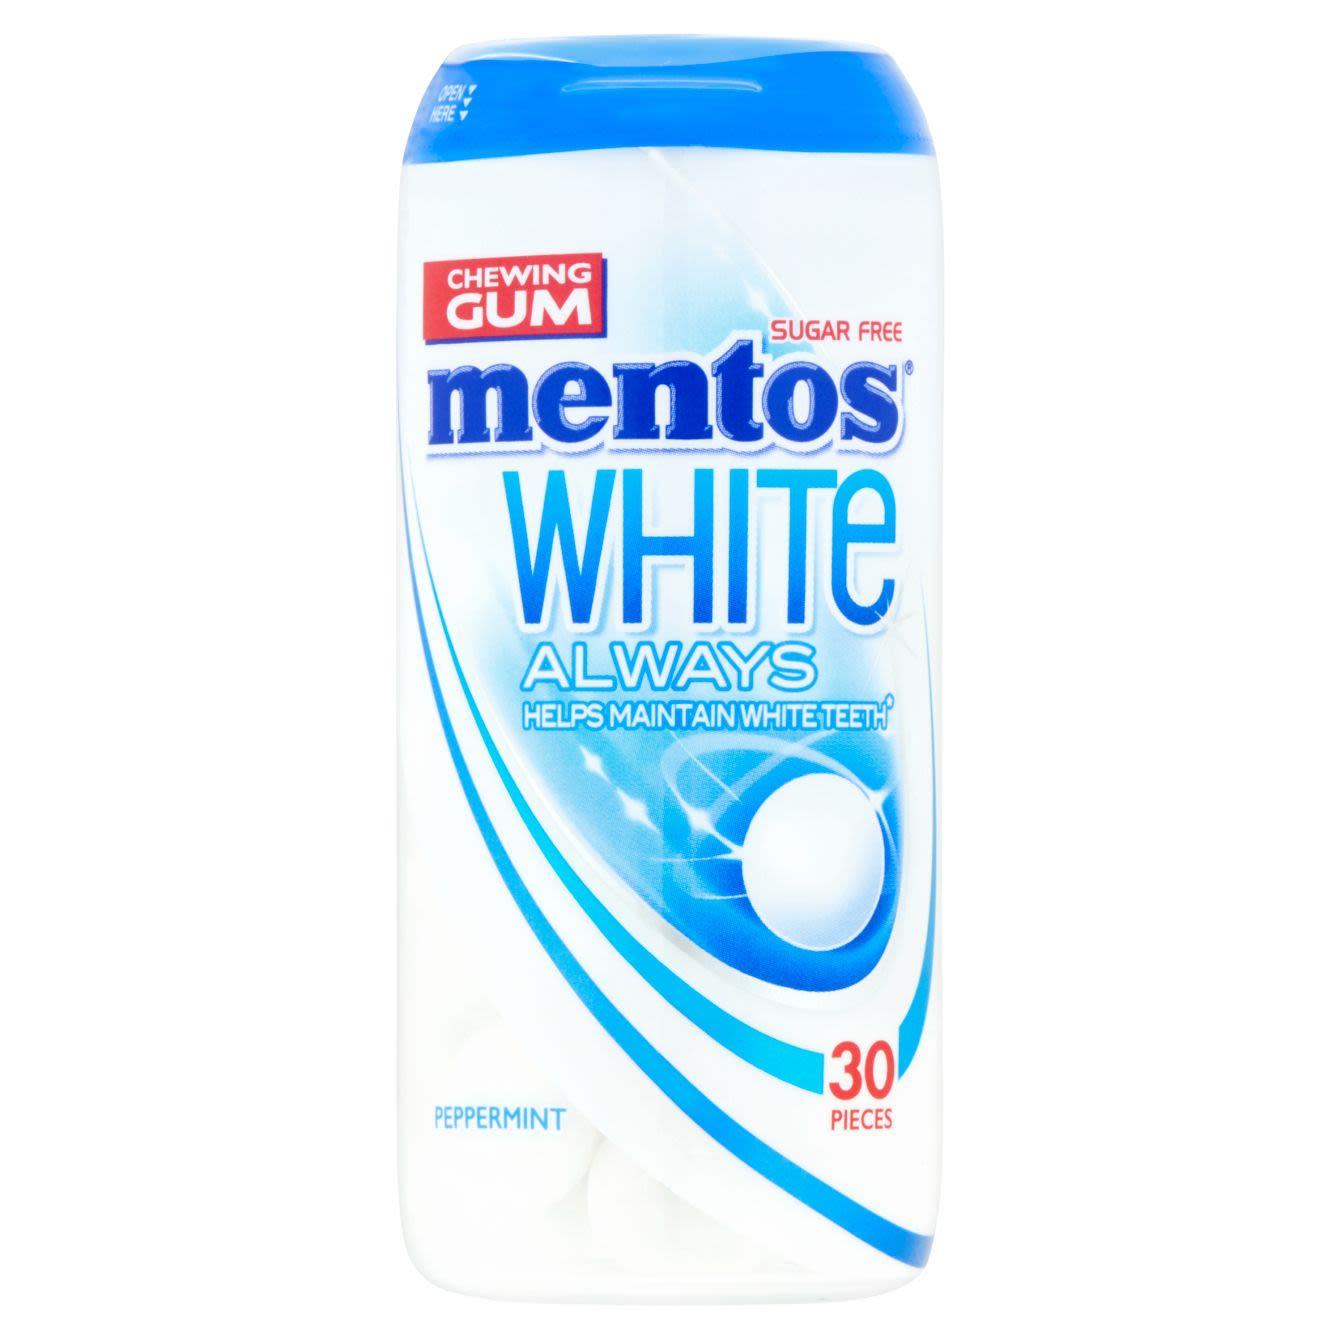 Mentos Gum White Always Peppermint 30p